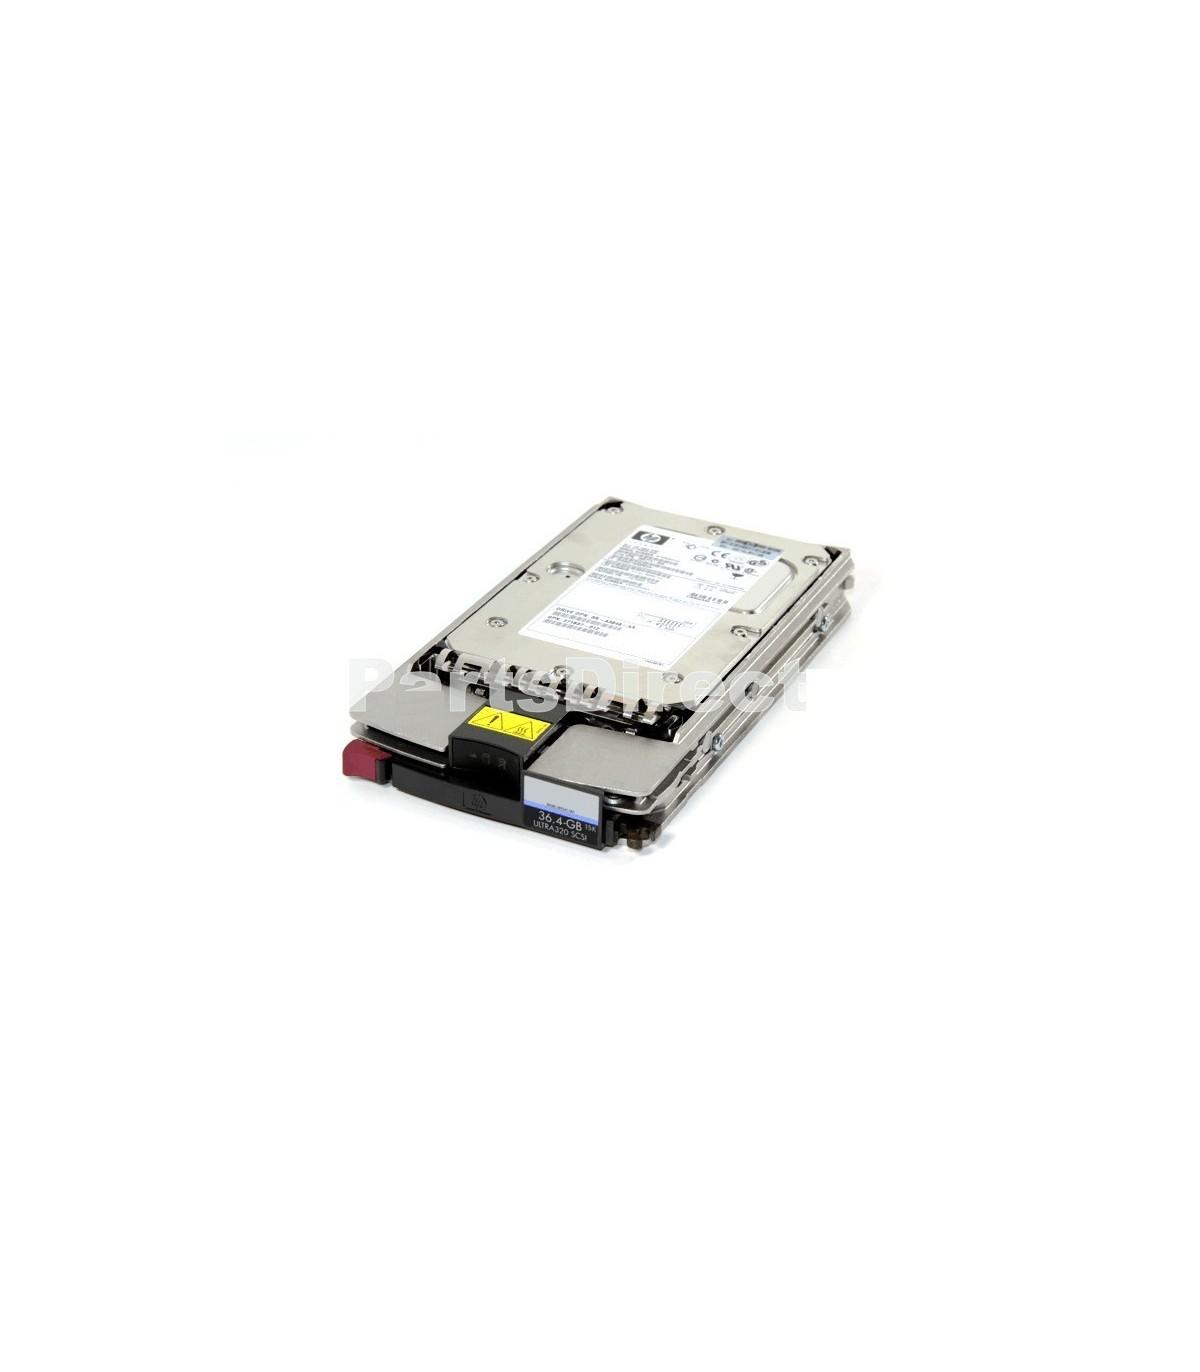 BF0368A4CA HP 36.4GB Ultra320 3.5-inch 15K SCSI Hot-Plug Hard Drive 286776-B22